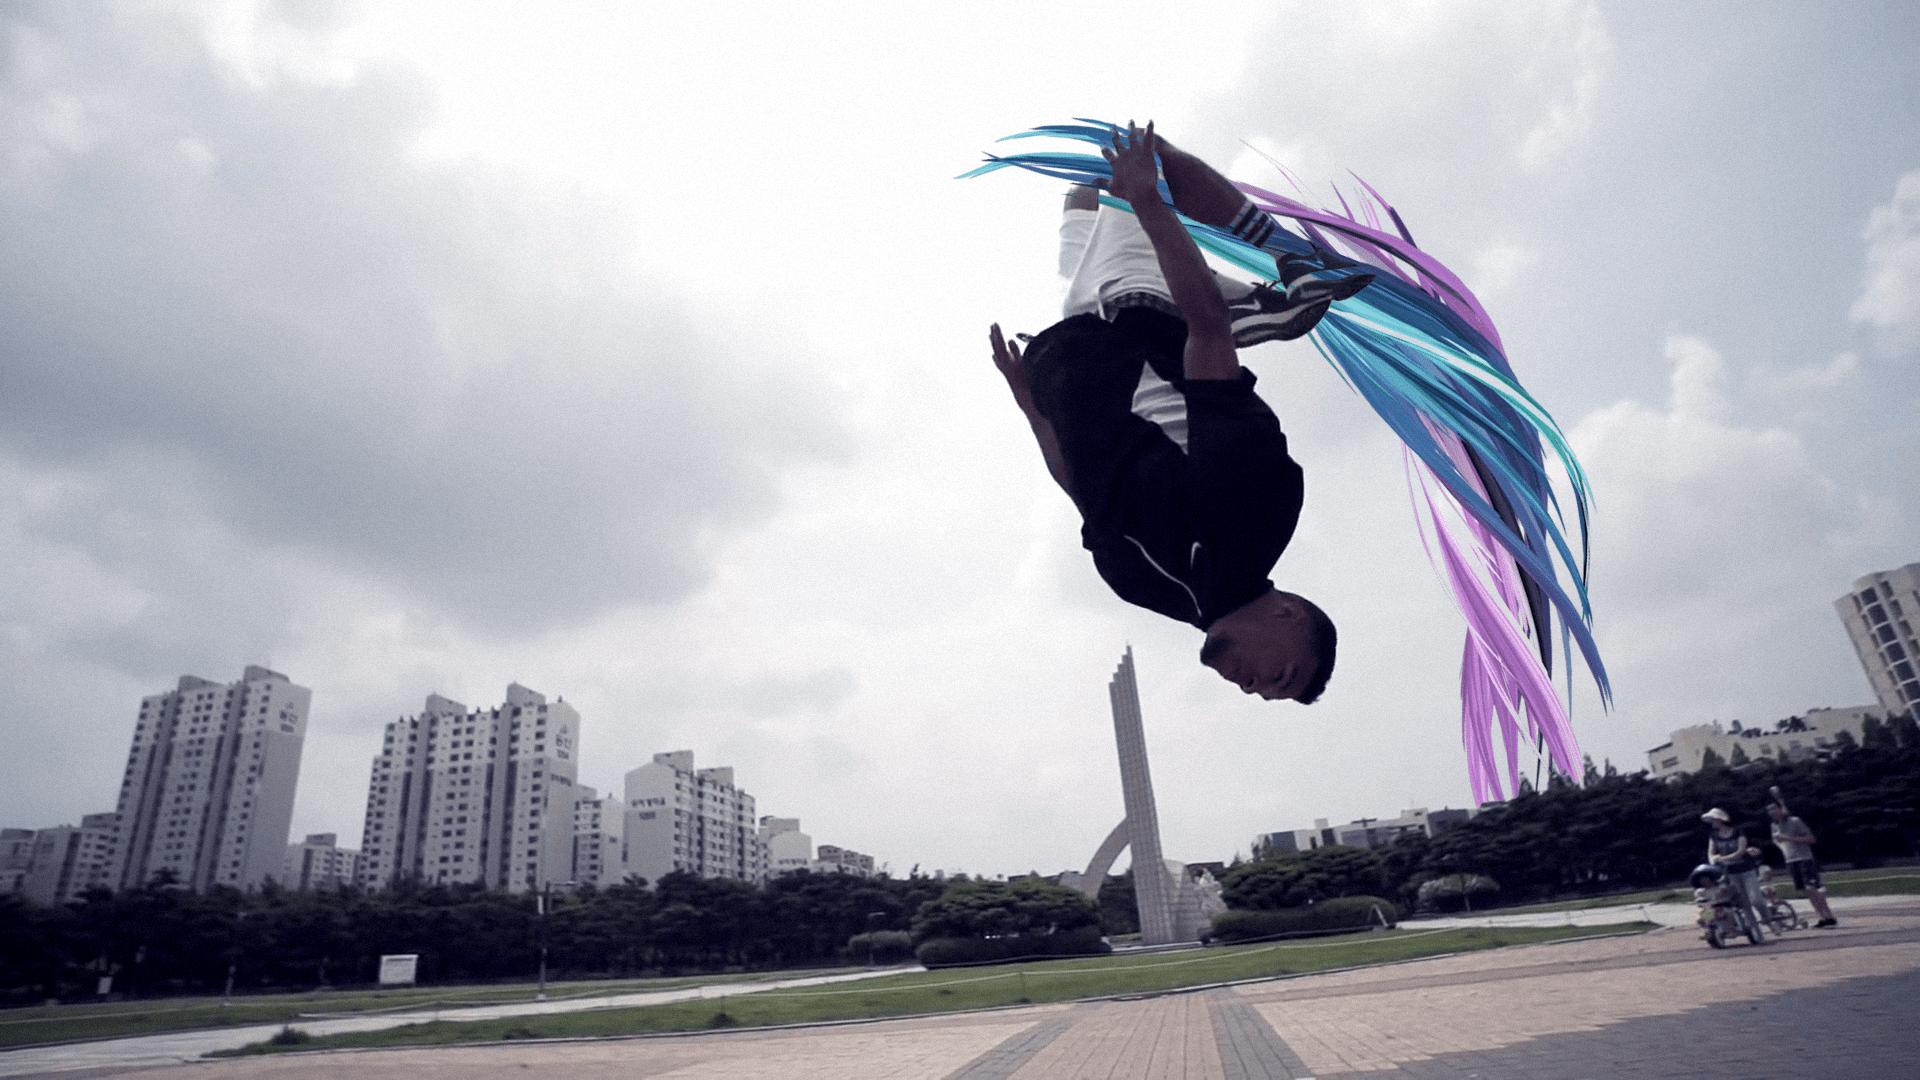 Štýl v pohybe breakdance